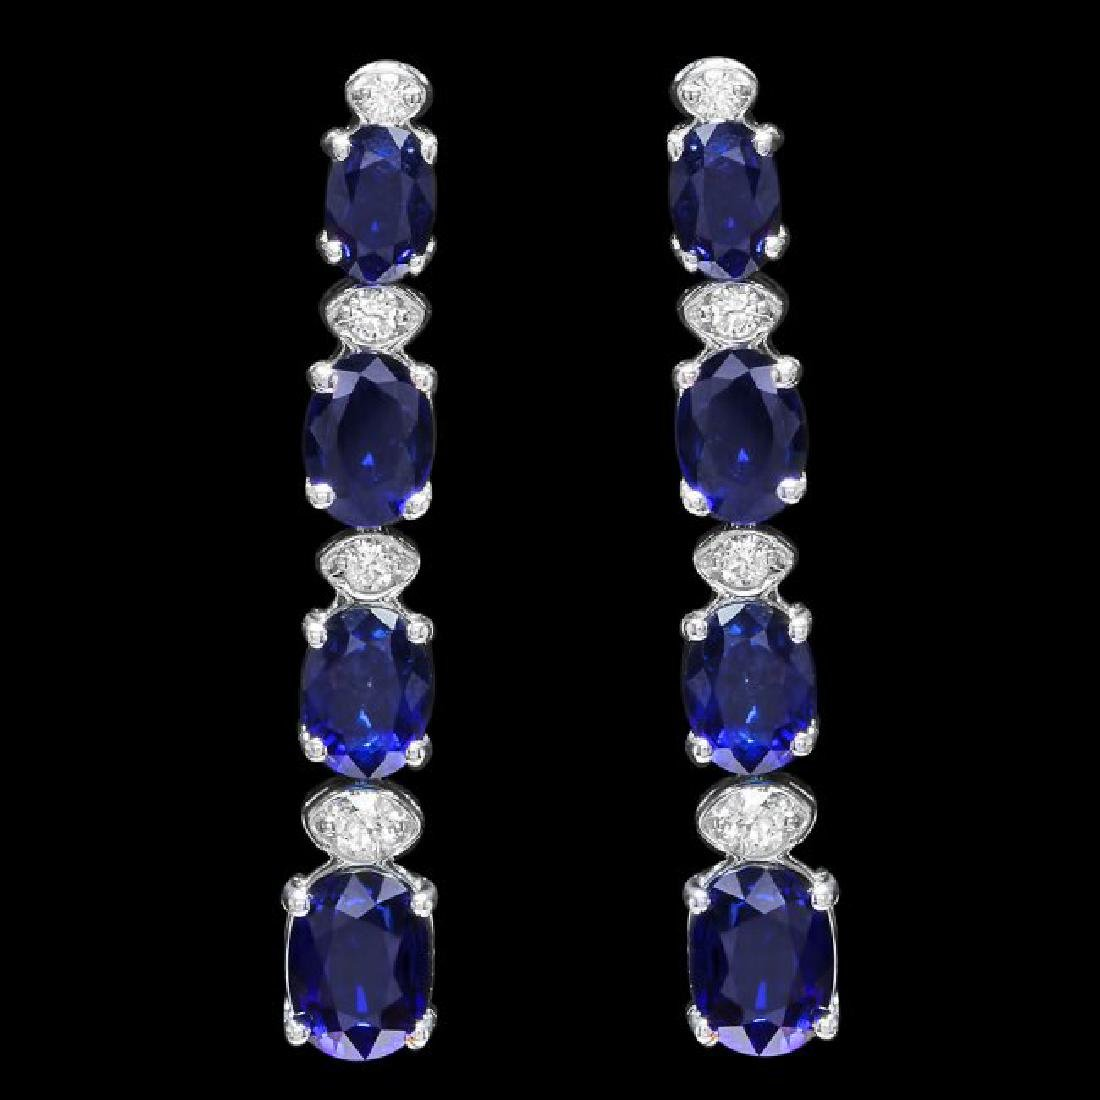 14k Gold 6.00ct Sapphire 0.30ct Diamond Earrings